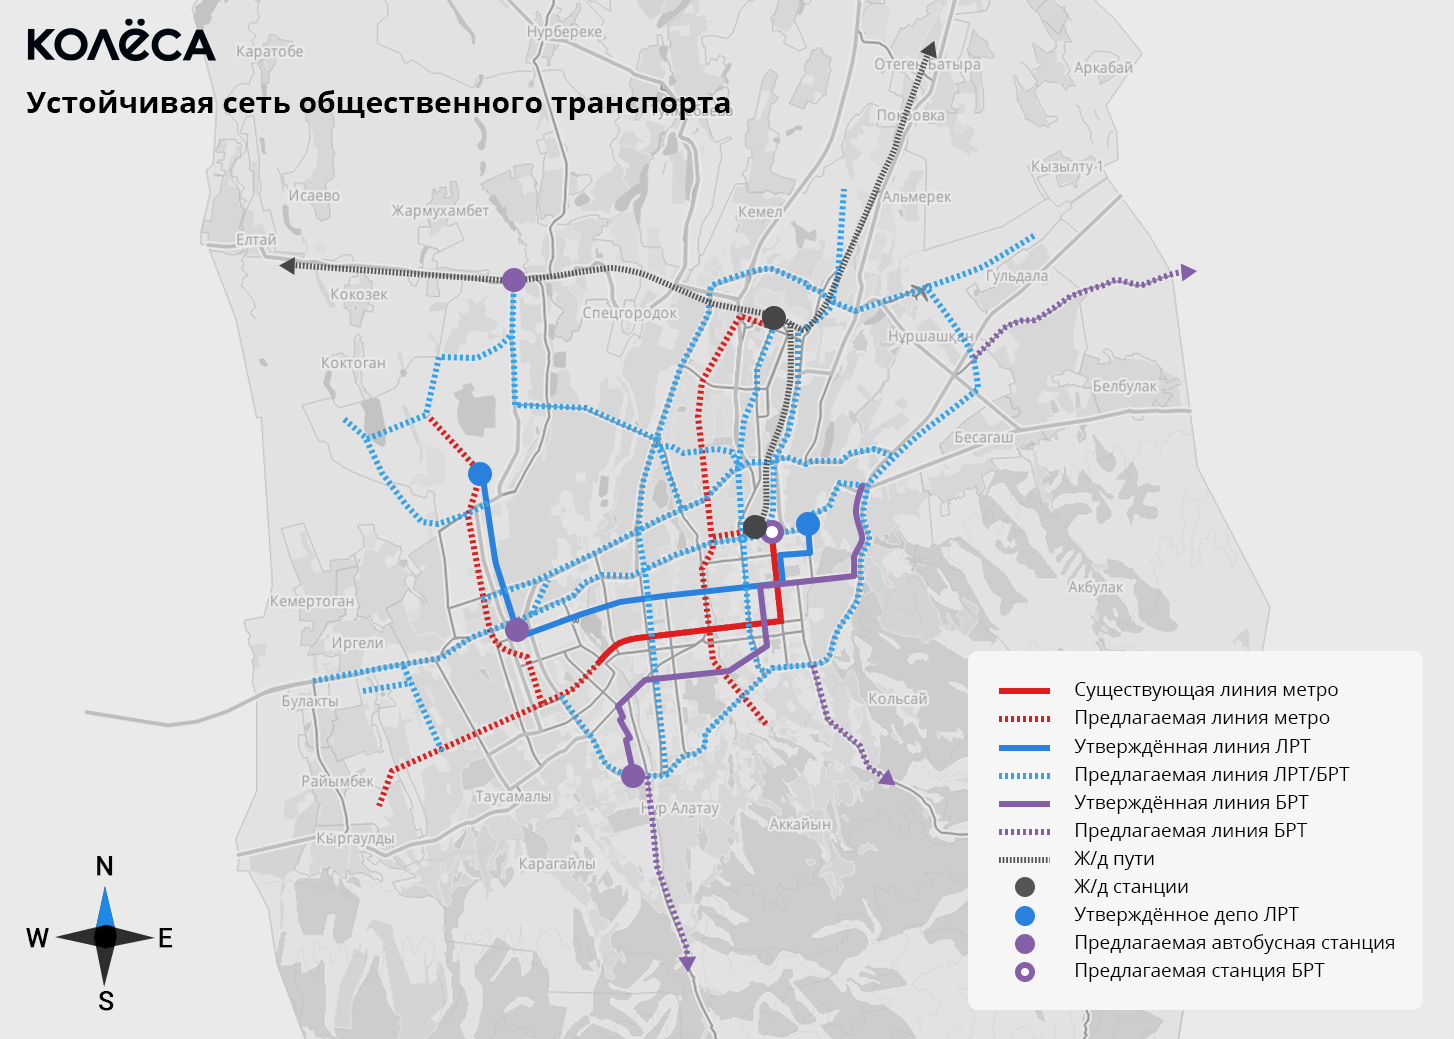 brt-lrt-2050-map.jpg